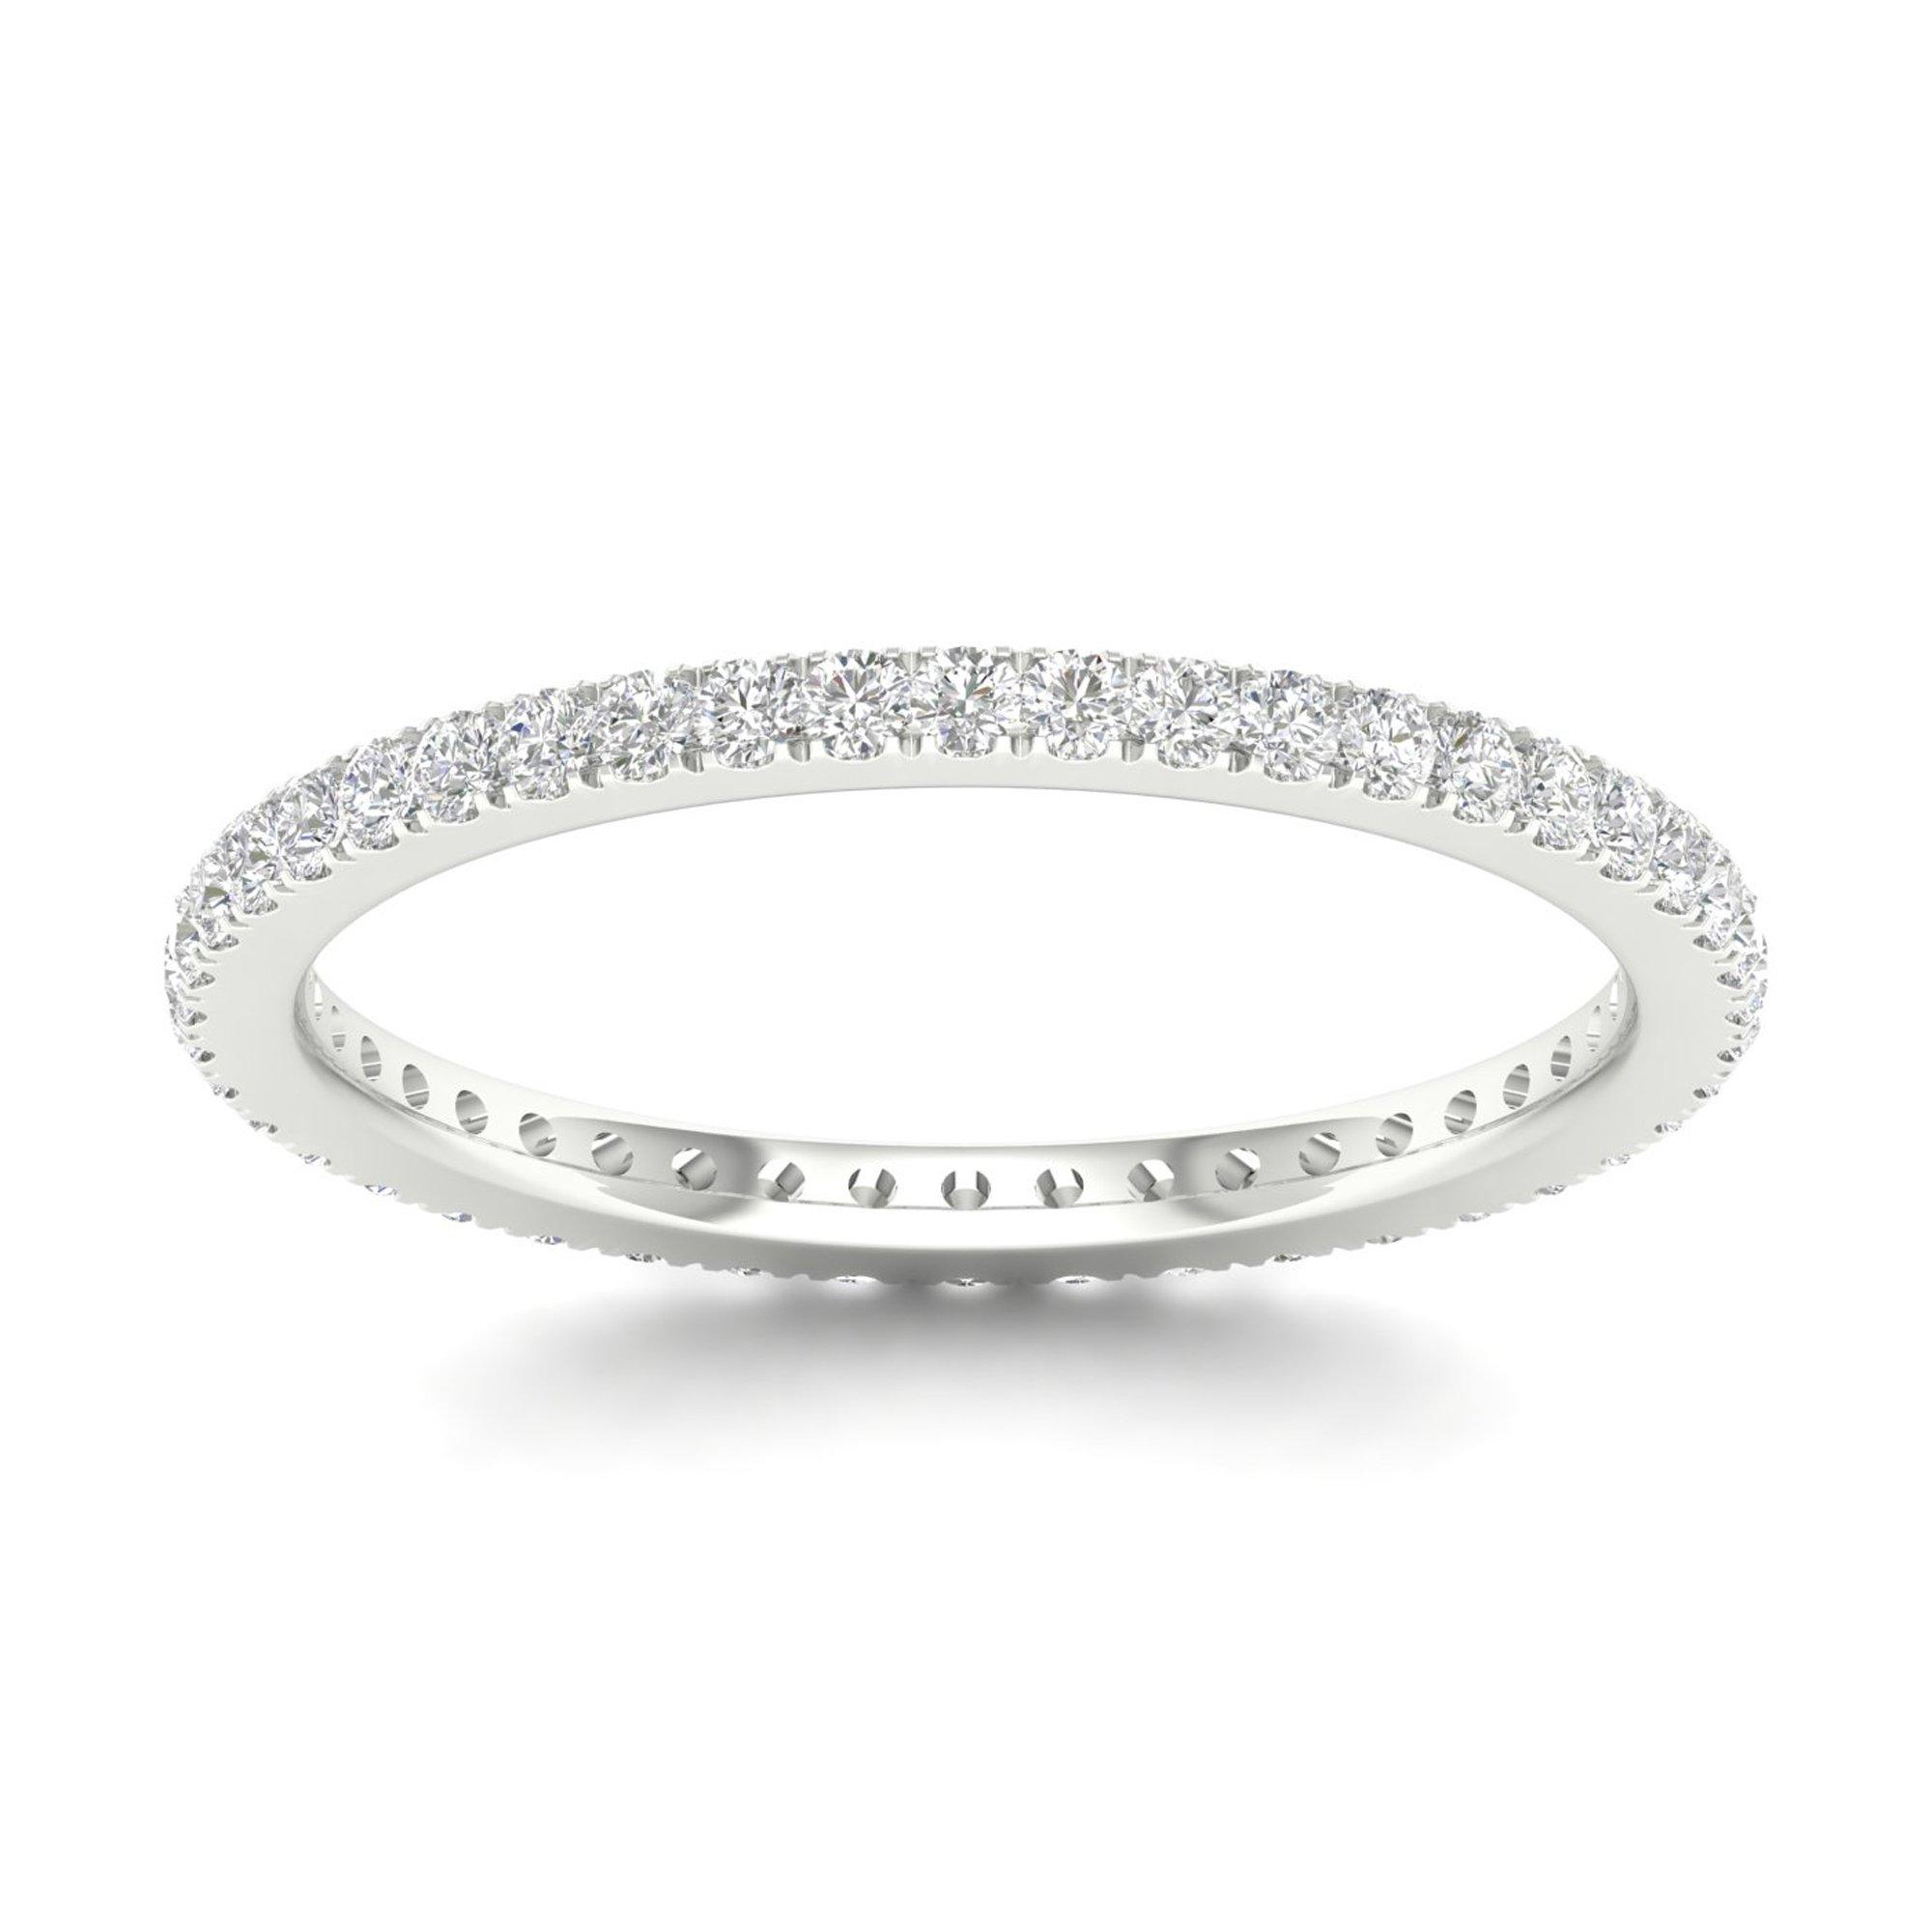 IGI Certified 14k White Gold 1/3ct TDW Diamond Eternity Wedding Band (H-I, I2) by Diamond Hub